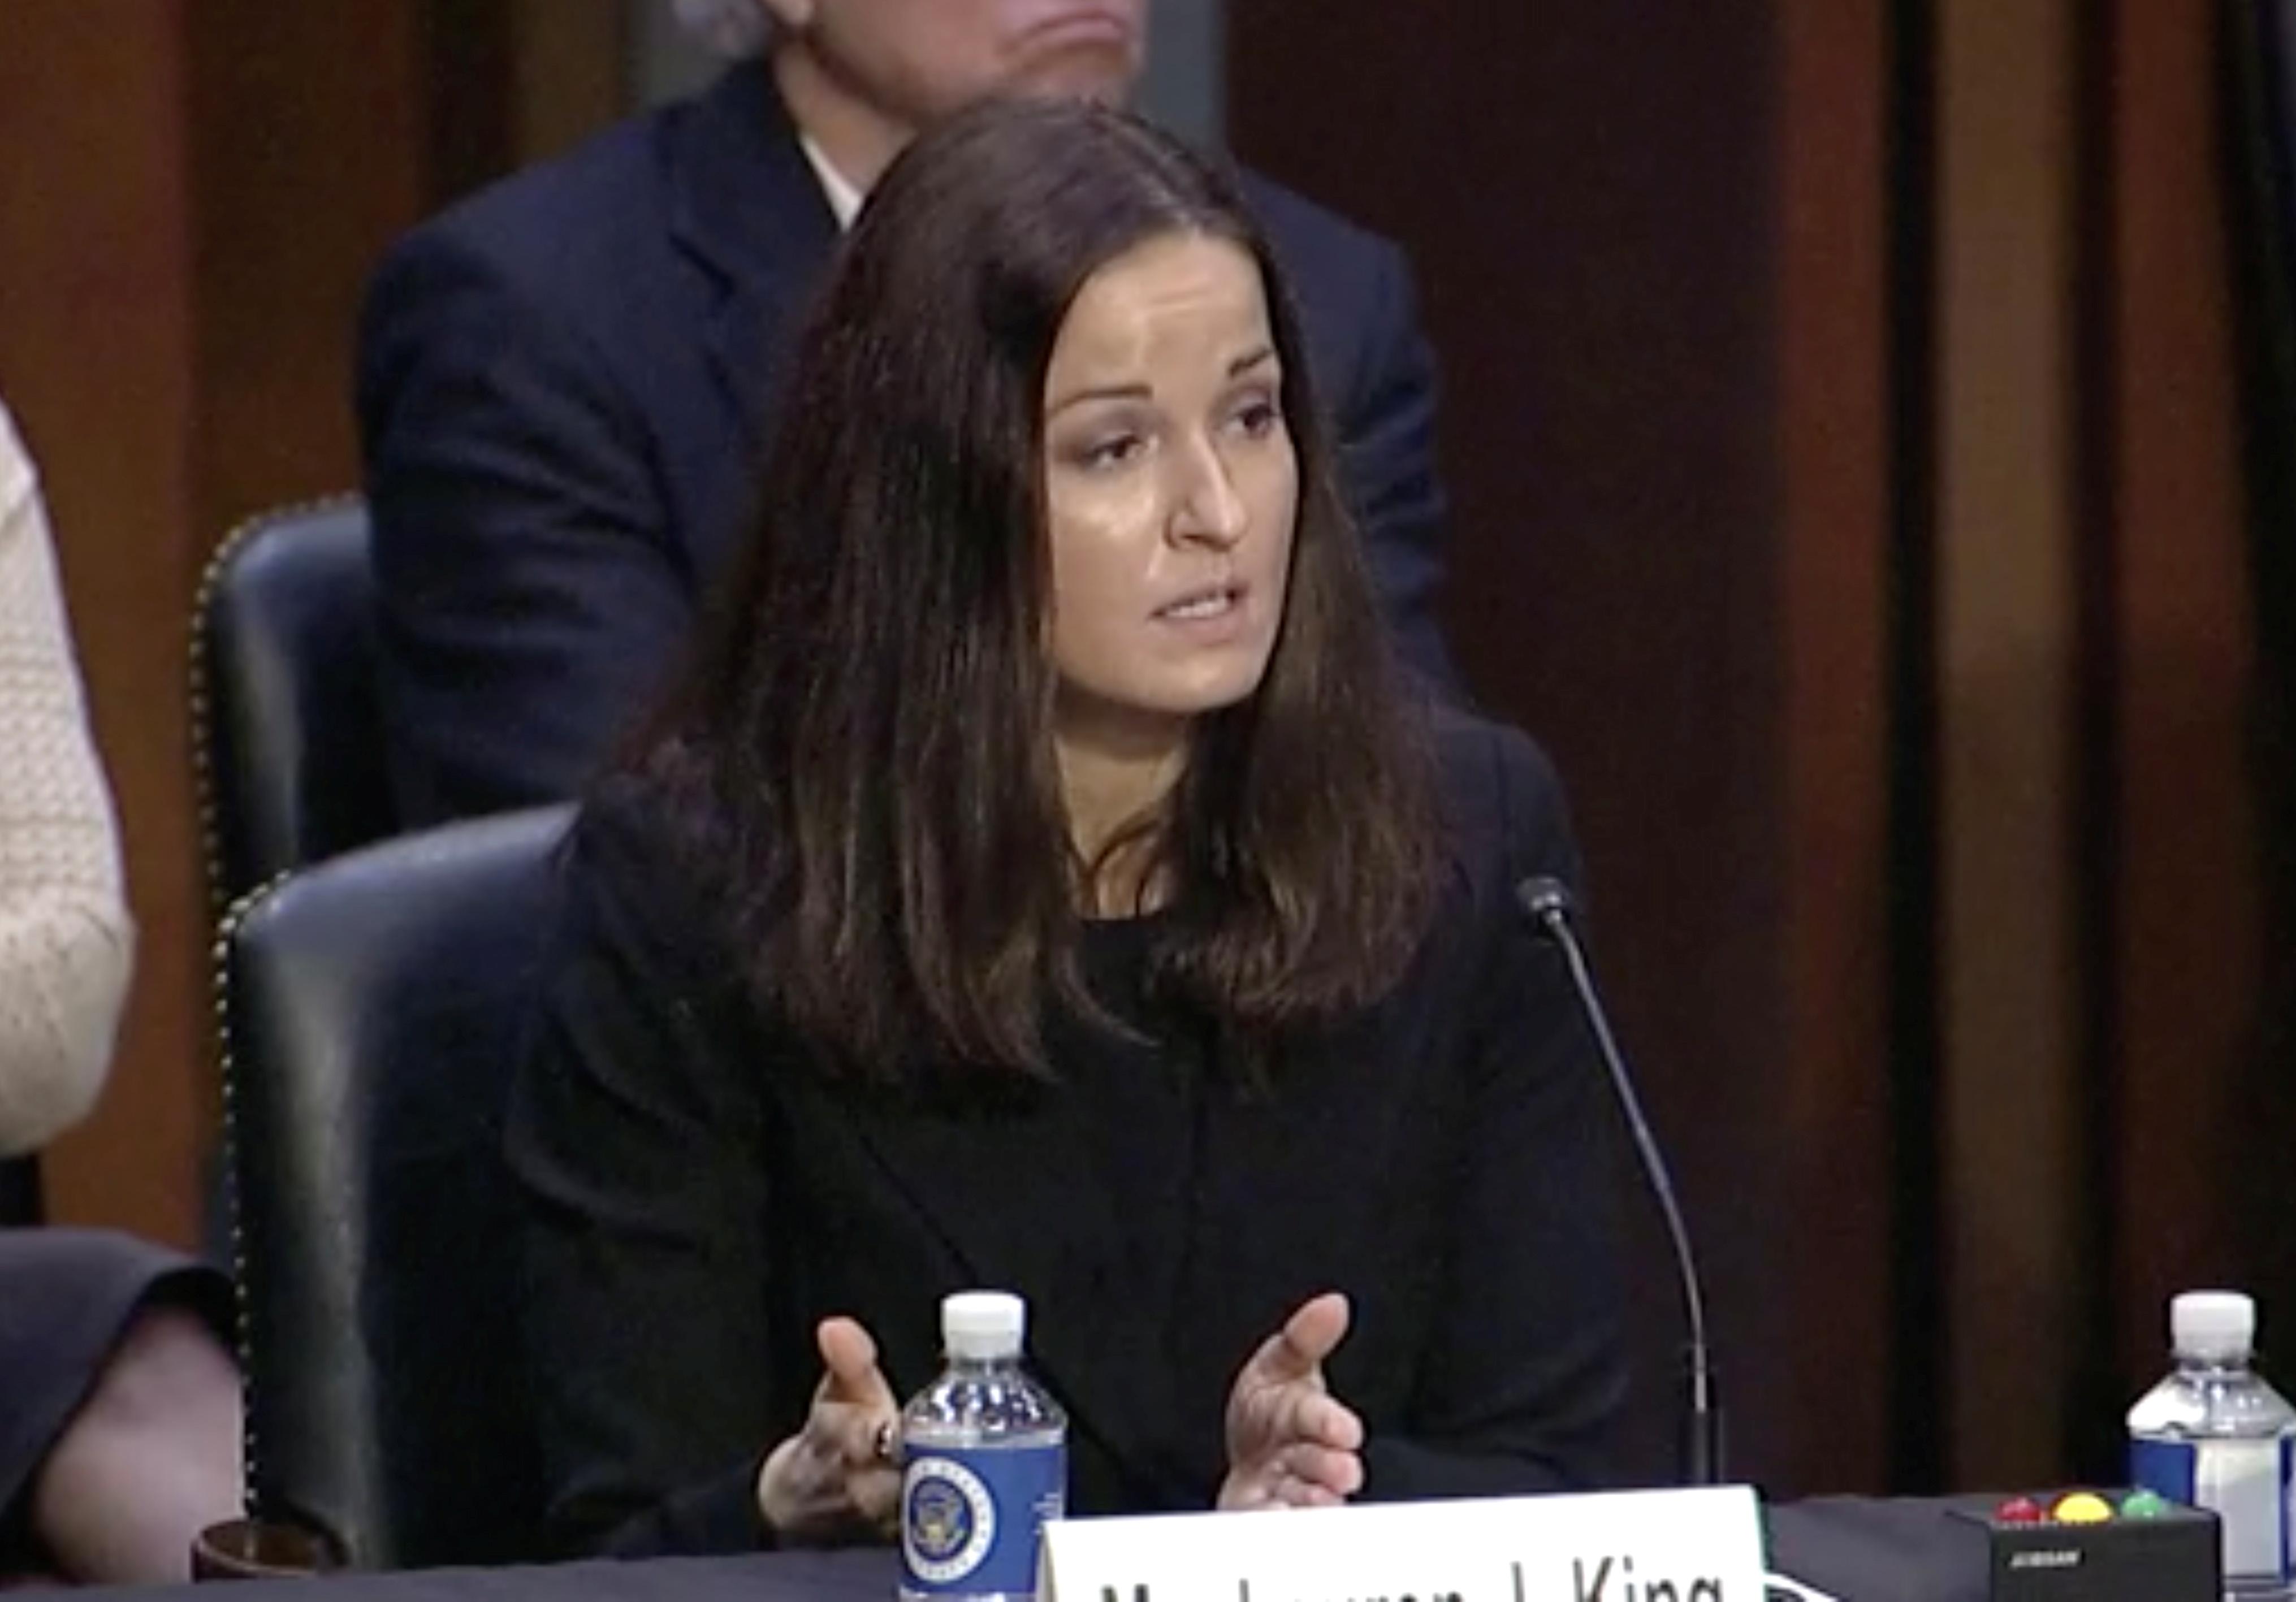 Lauren King testifies before a Senate Judiciary Committee on Capitol Hill in Washington, June 9, 2021. U.S. Senate/Handout via Reuters